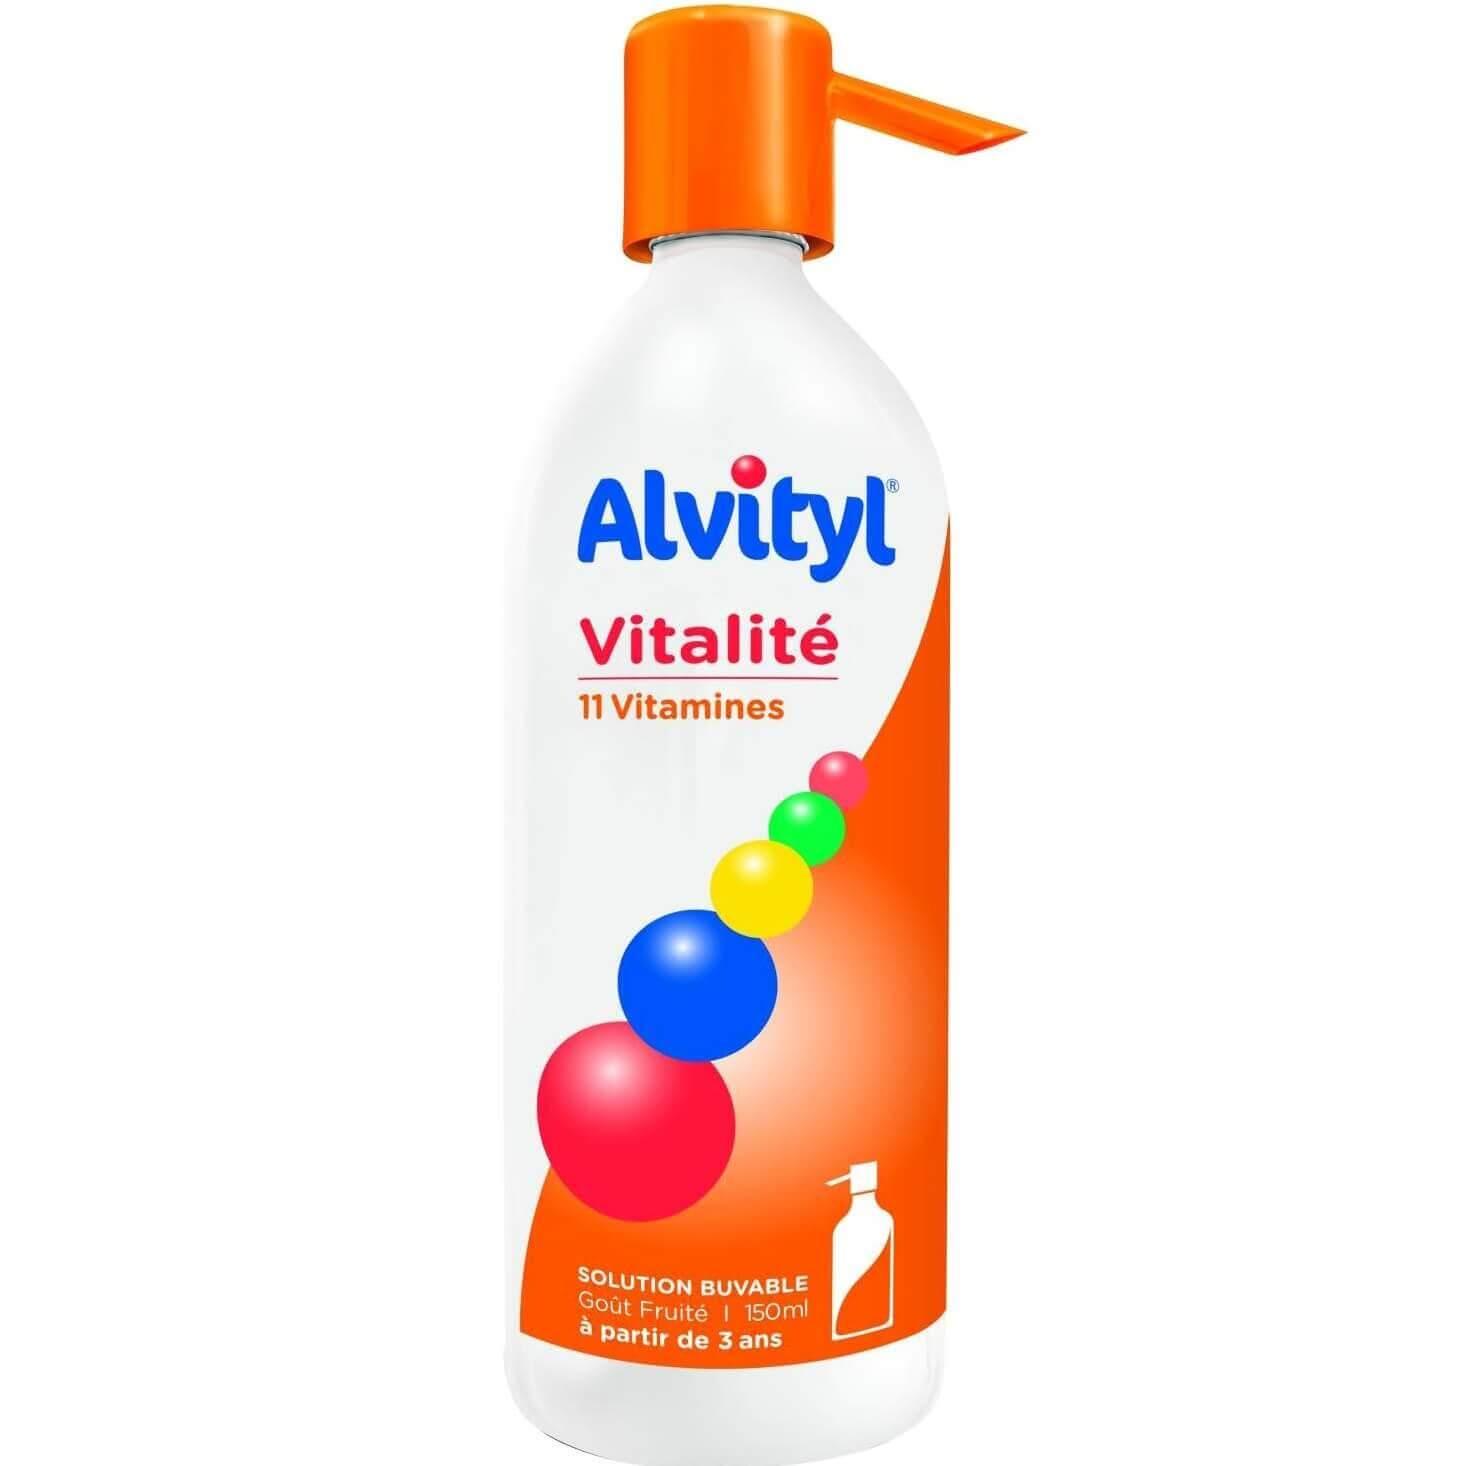 Alvityl Σιρόπι Πολυβιταμινούχο Συμπλήρωμα Διατροφής με 11 Βιταμίνες 150ml